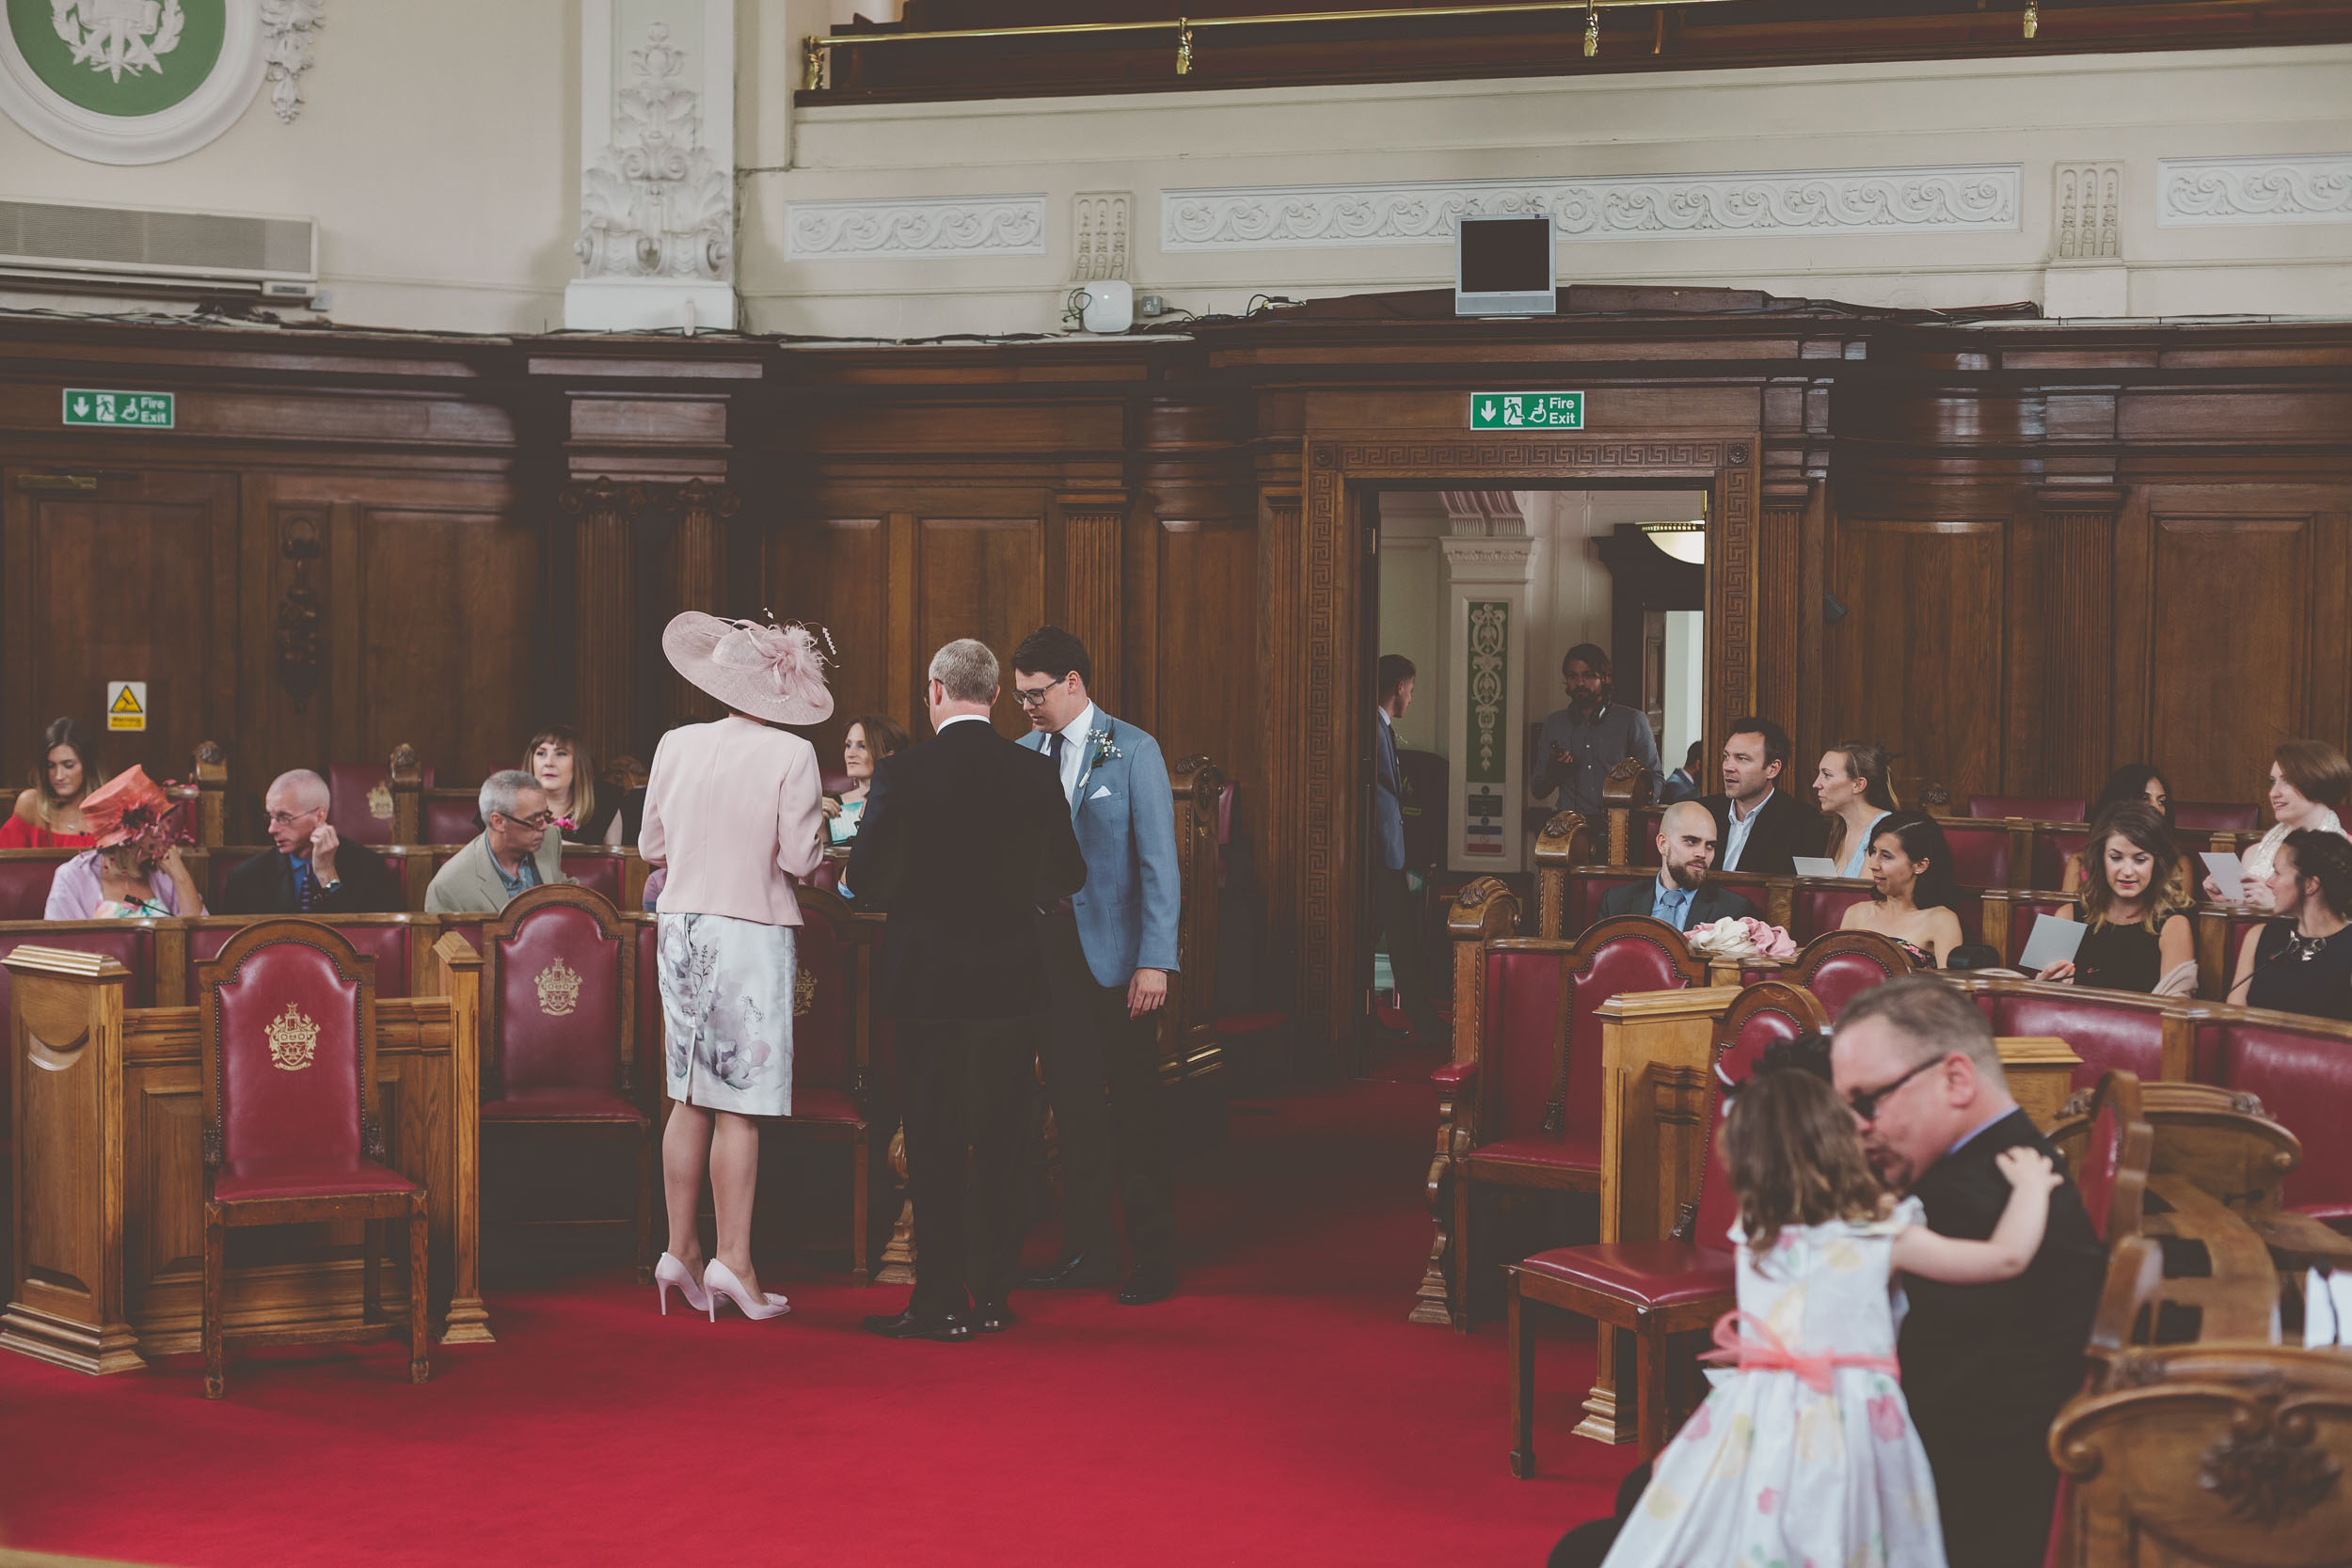 islington-town-hall-4th-floor-studios-wedding015.jpg